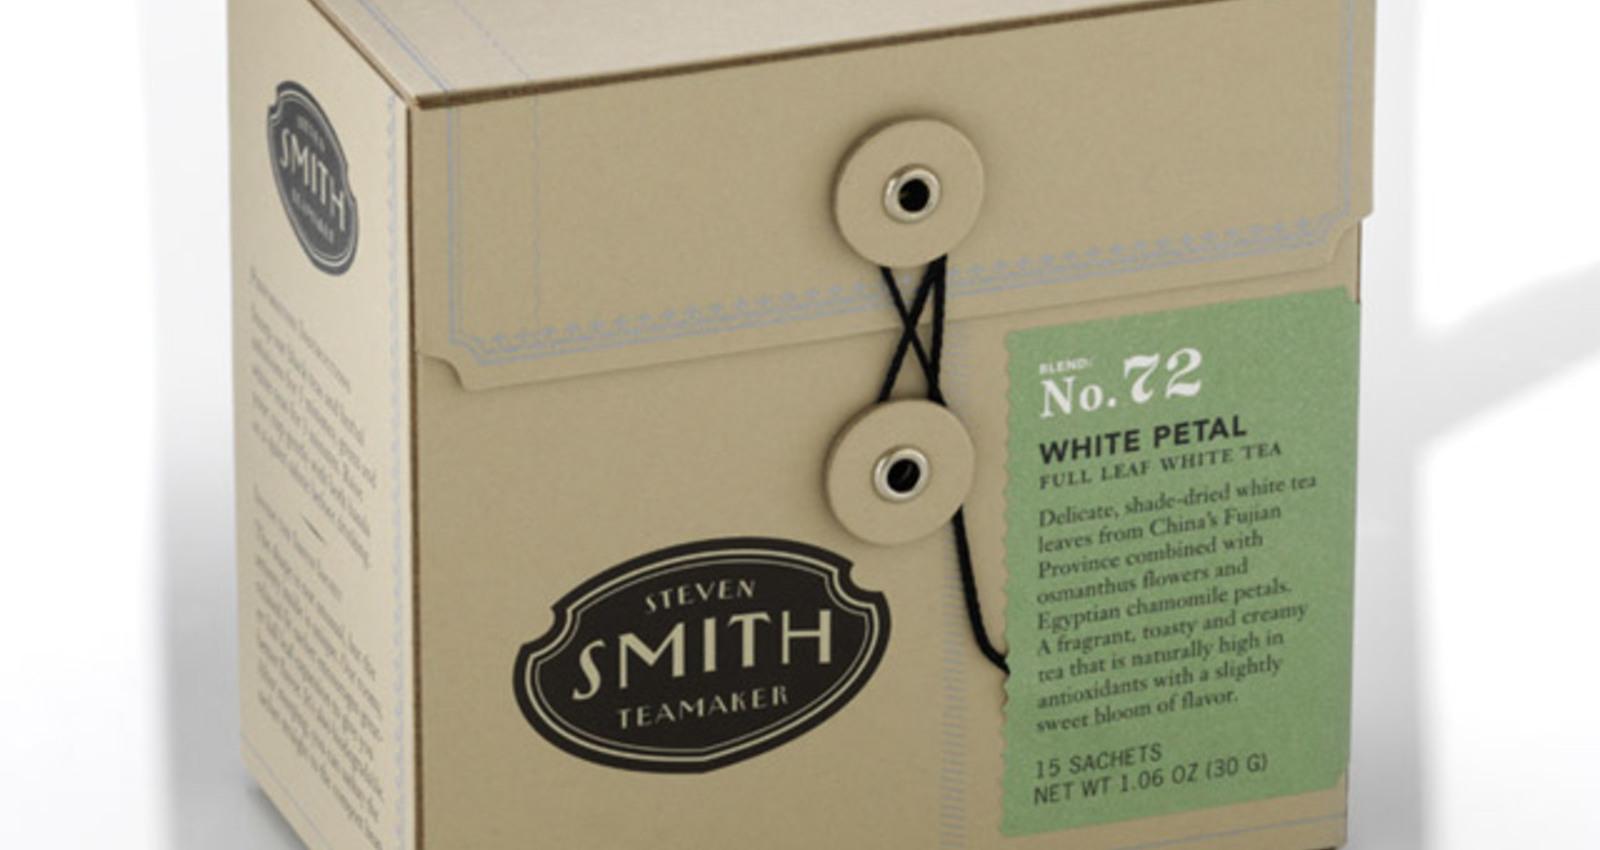 Steven Smith Teamaker String-Tie Box